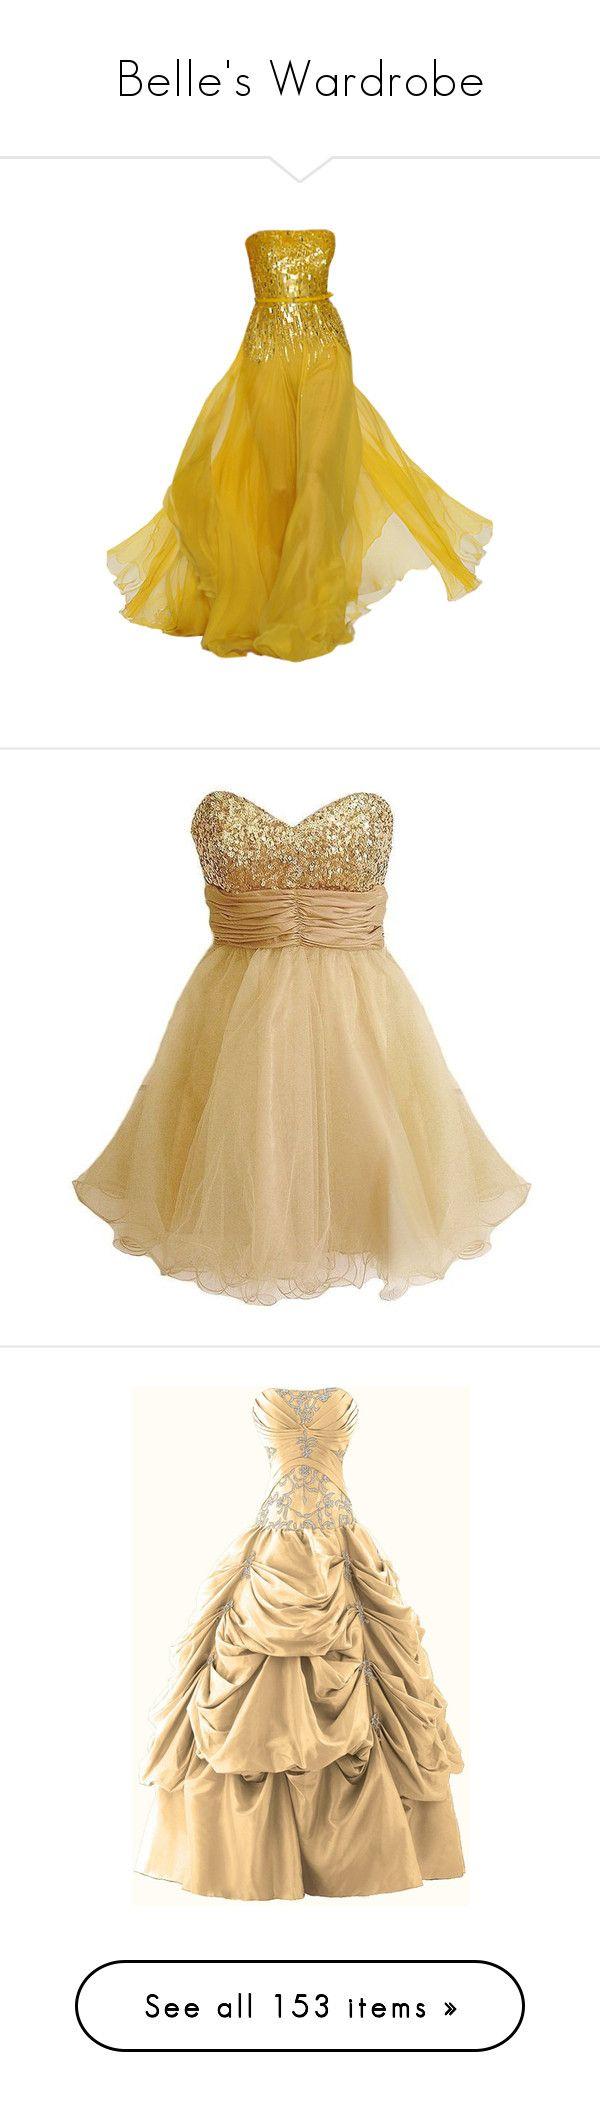 Belleus wardrobe